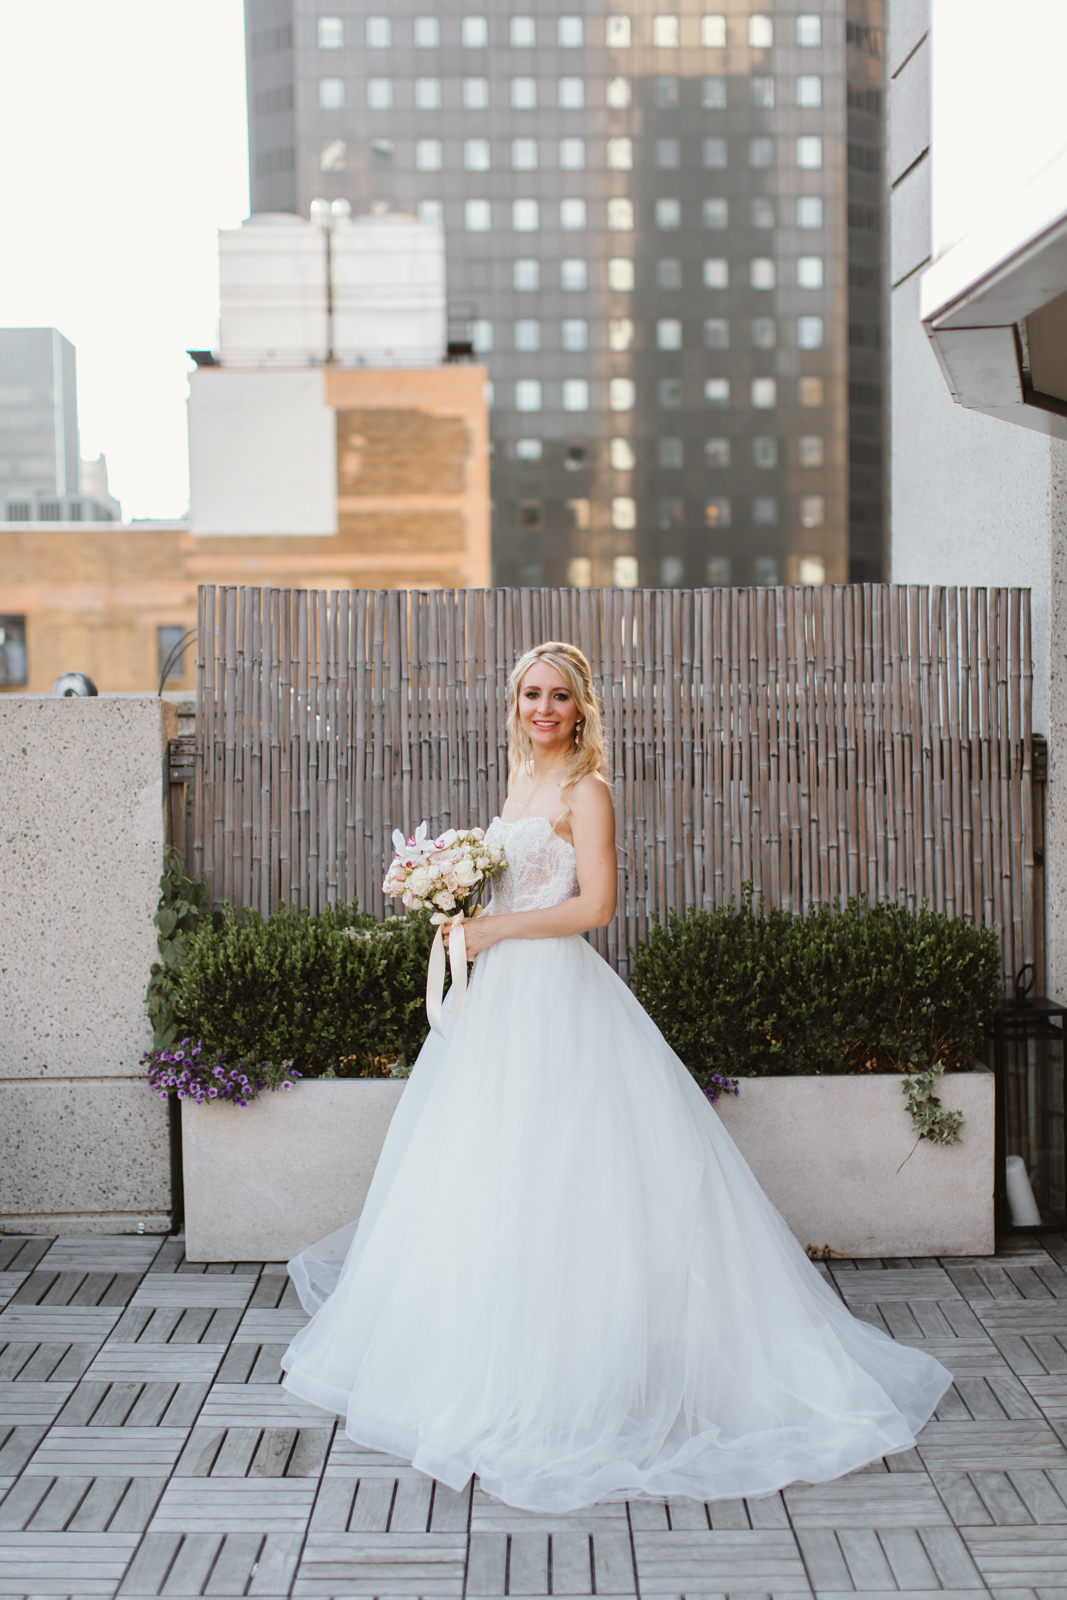 NYC Wedding Photography Sofitel Central Park Brooklyn Photographer Boris Zaretsky _B2C2736.jpg